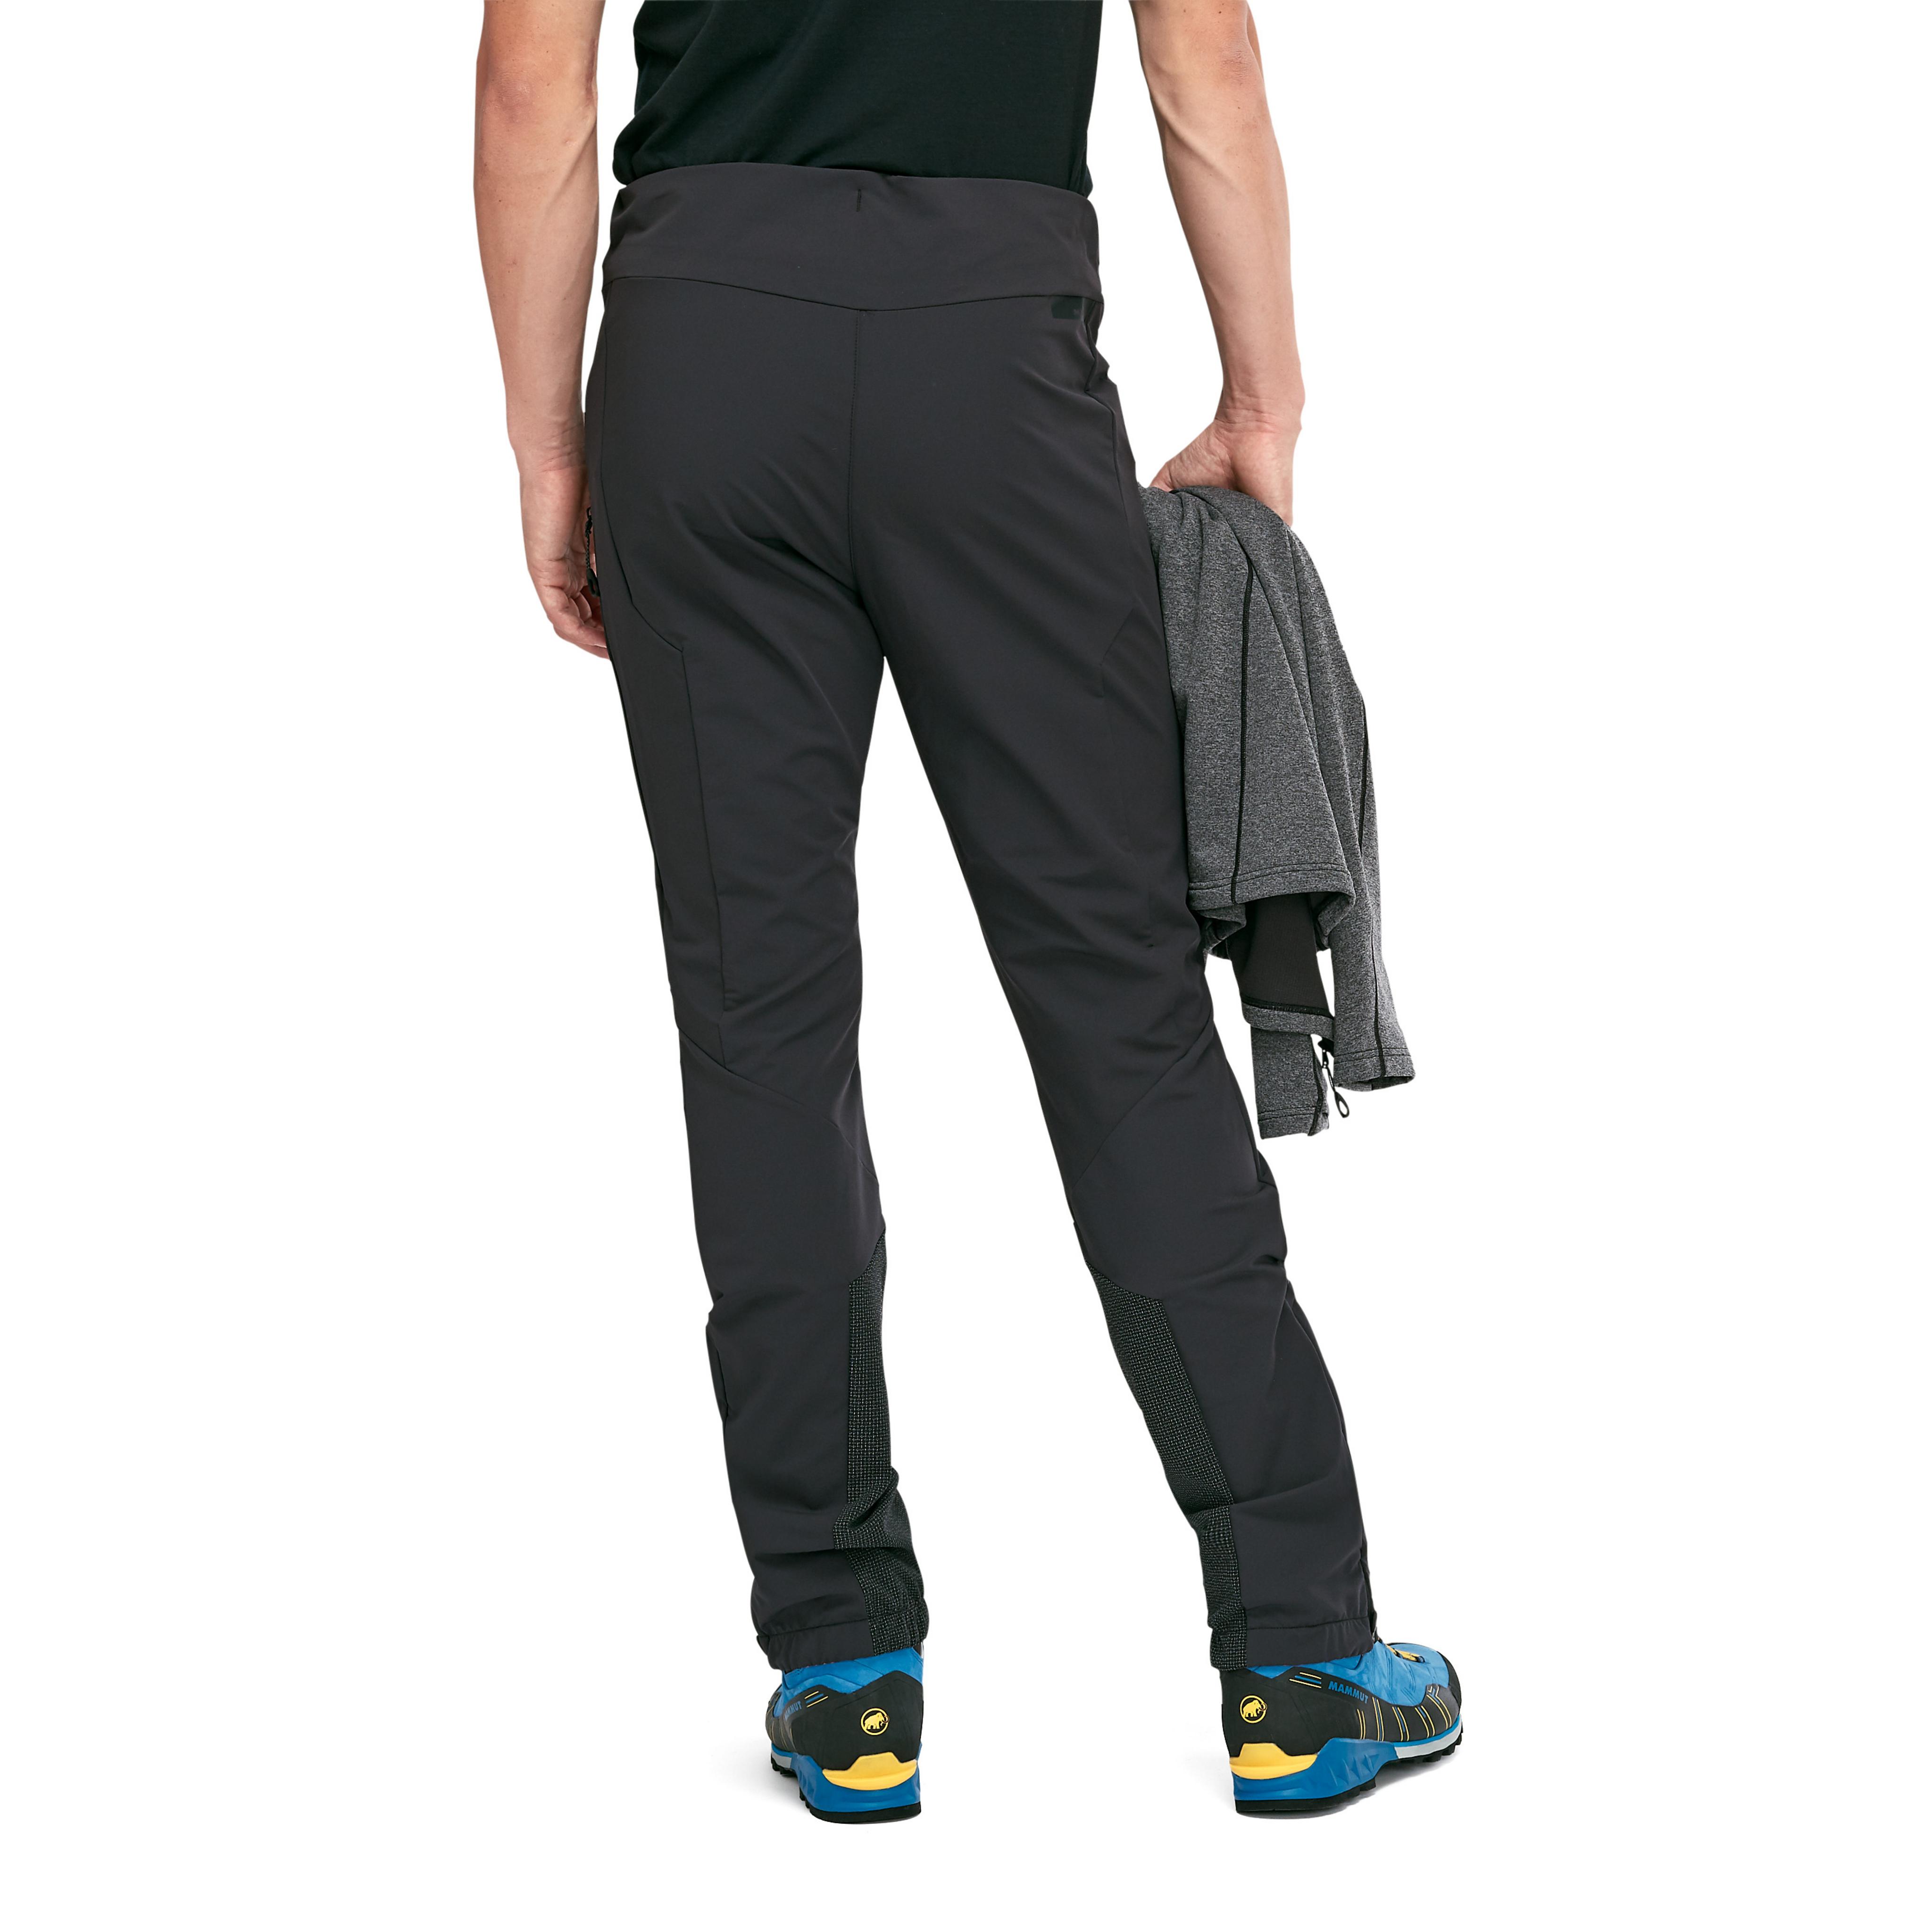 Aenergy Pro SO Pants Men product image